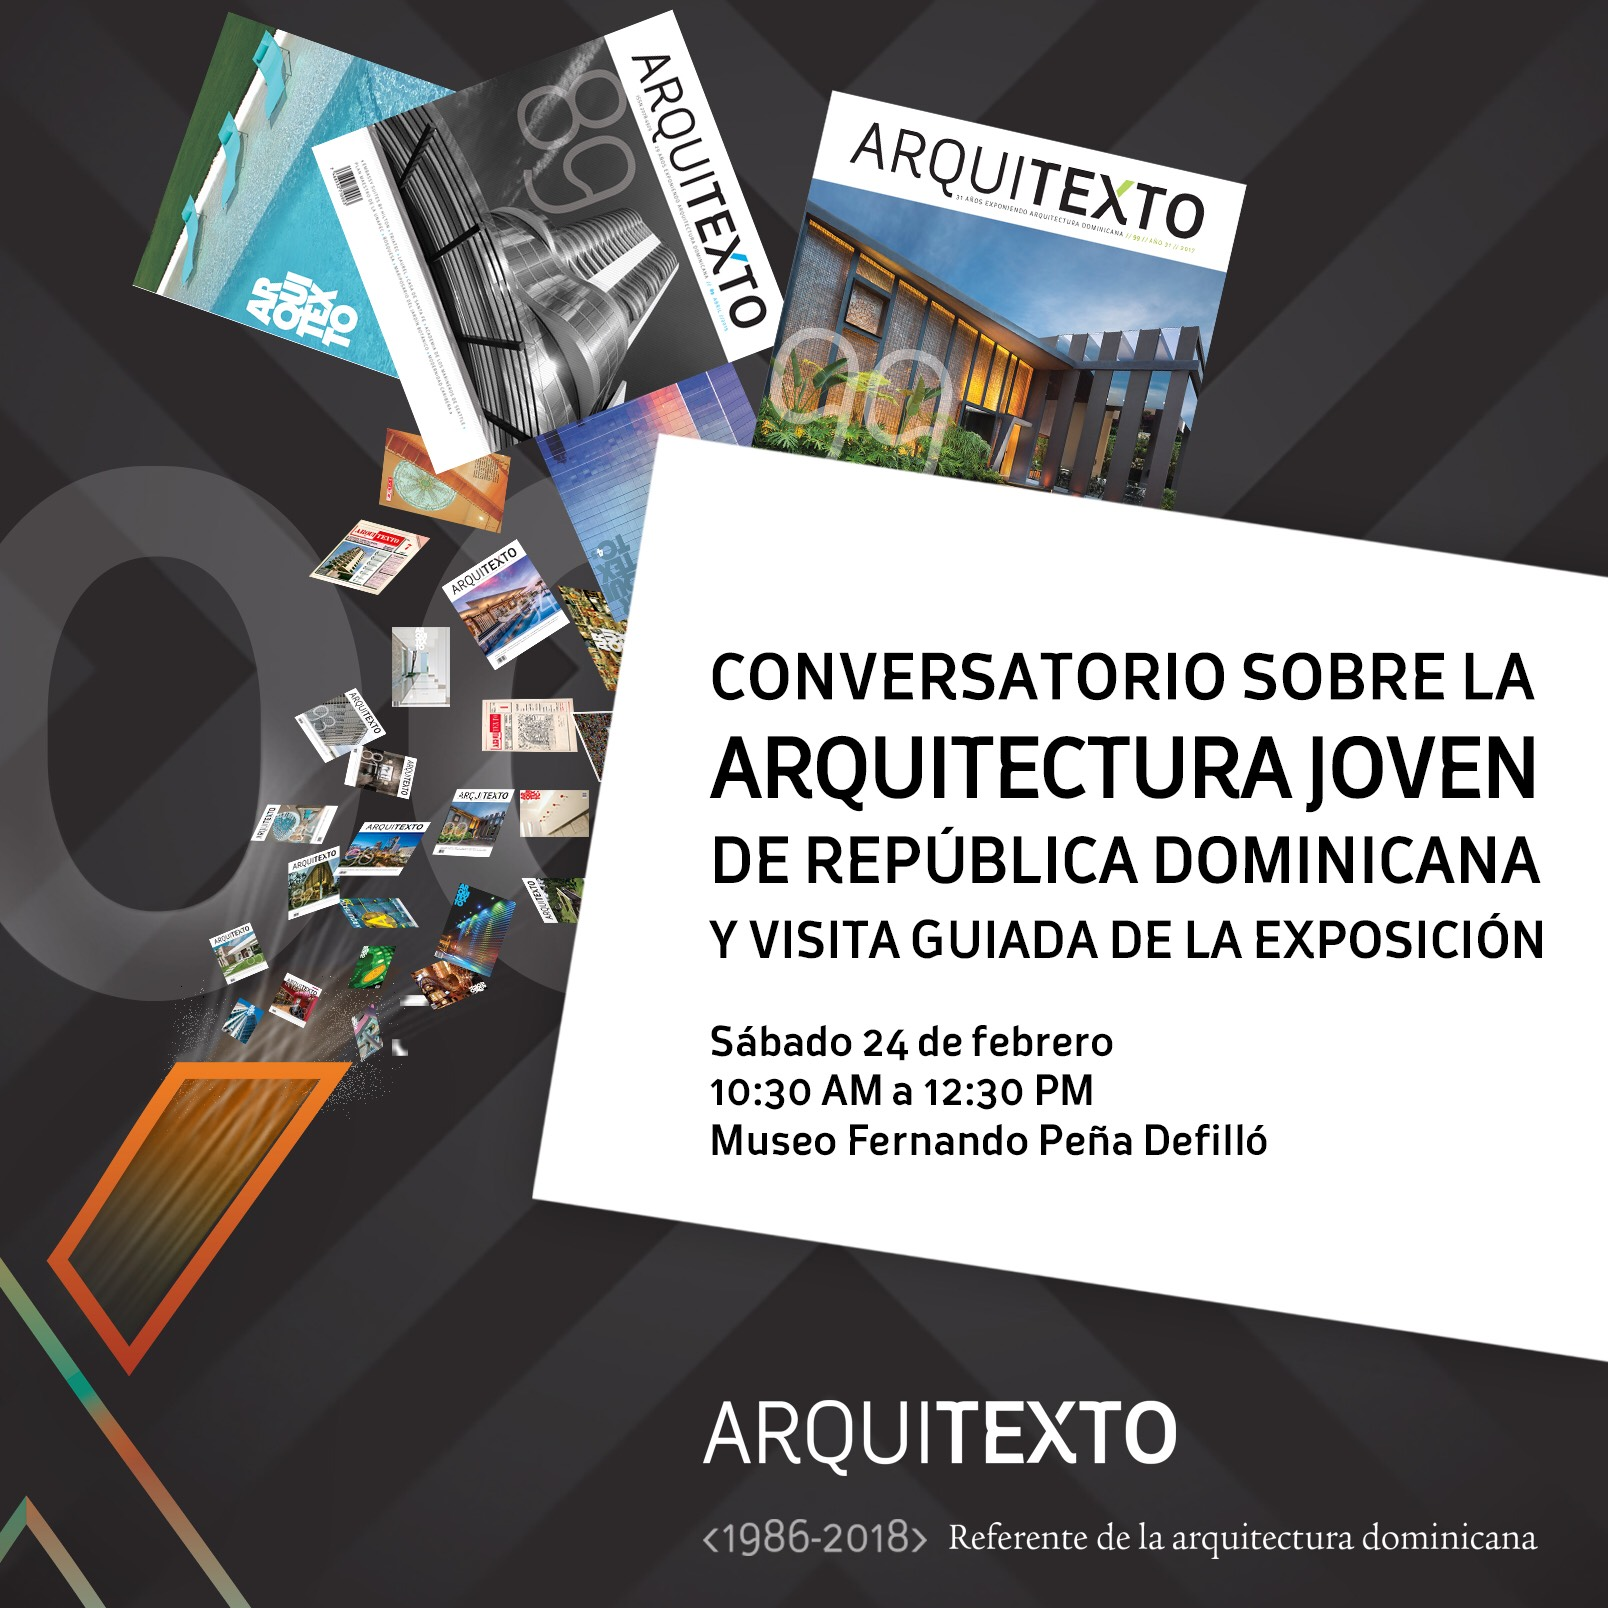 INVITACION ONVERSATORIO.jpg